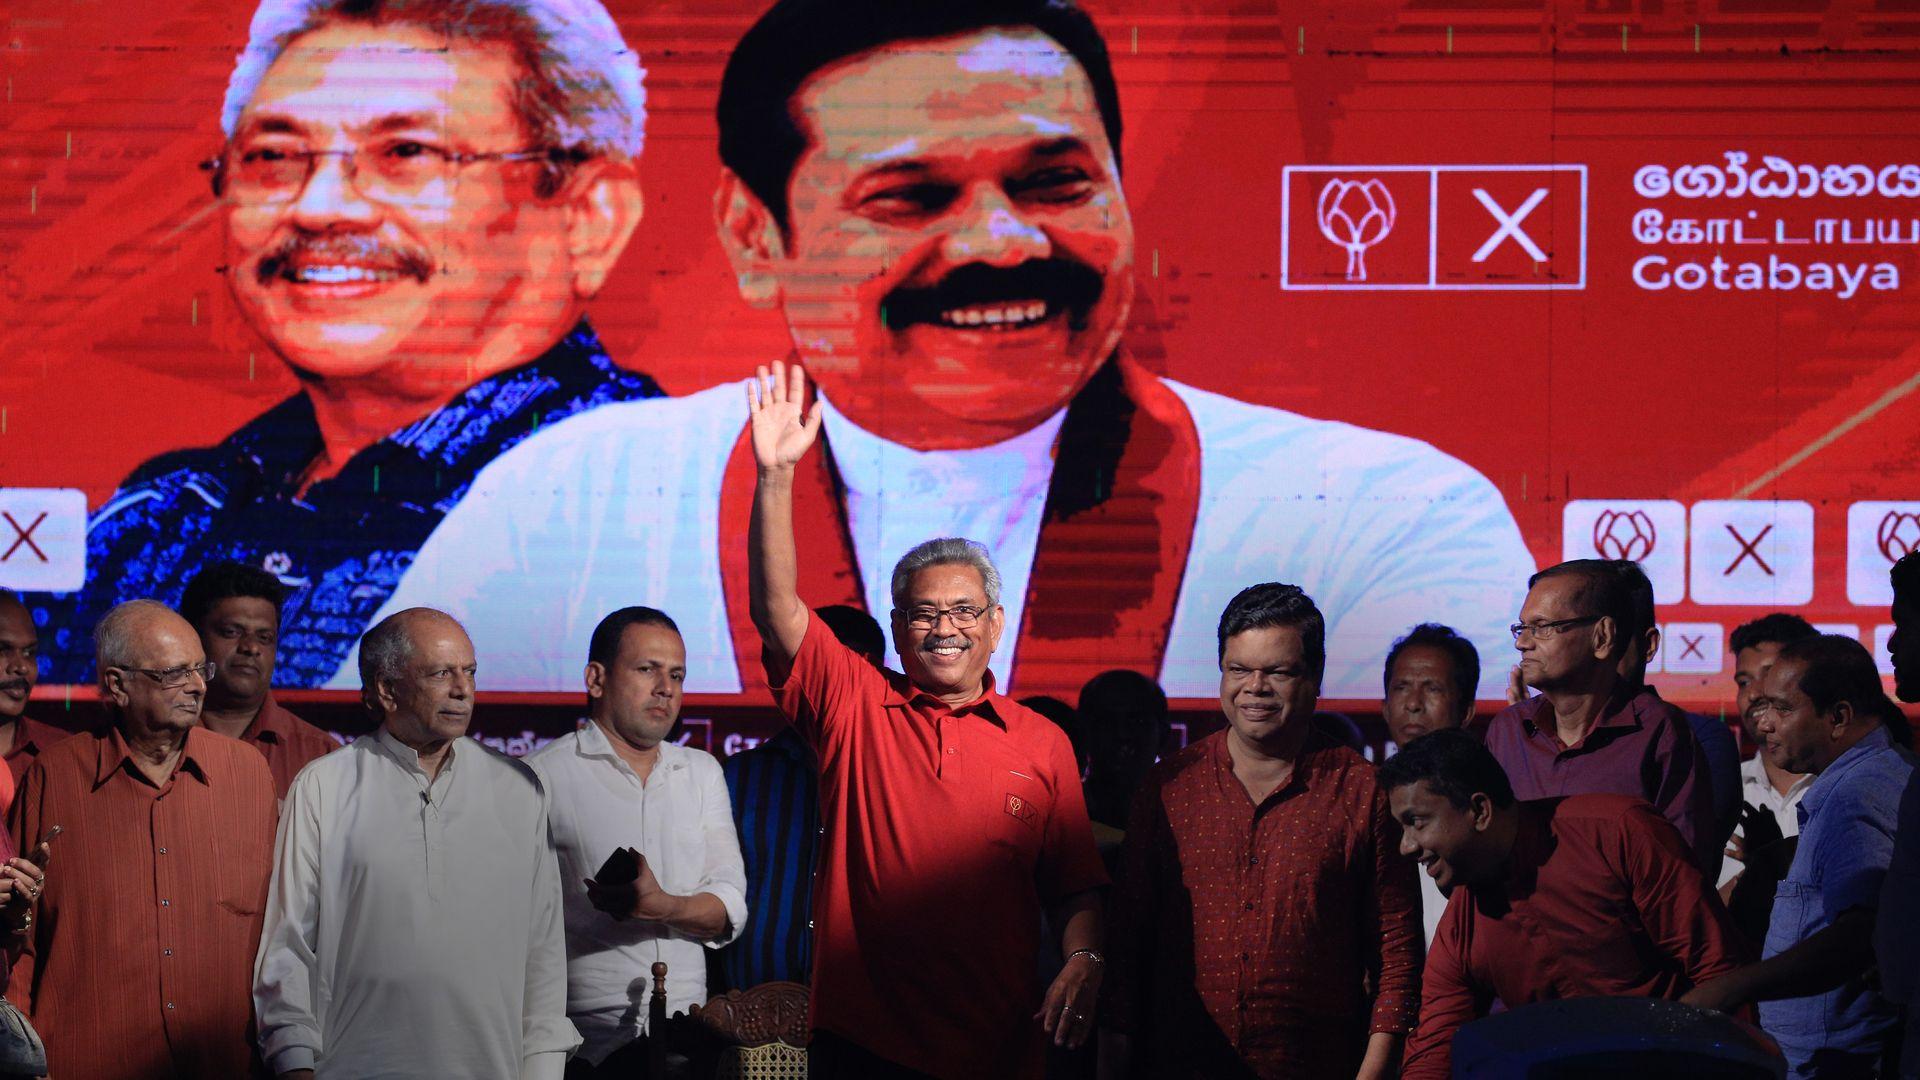 Gotabaya Rajapaksa celebrates at a rally